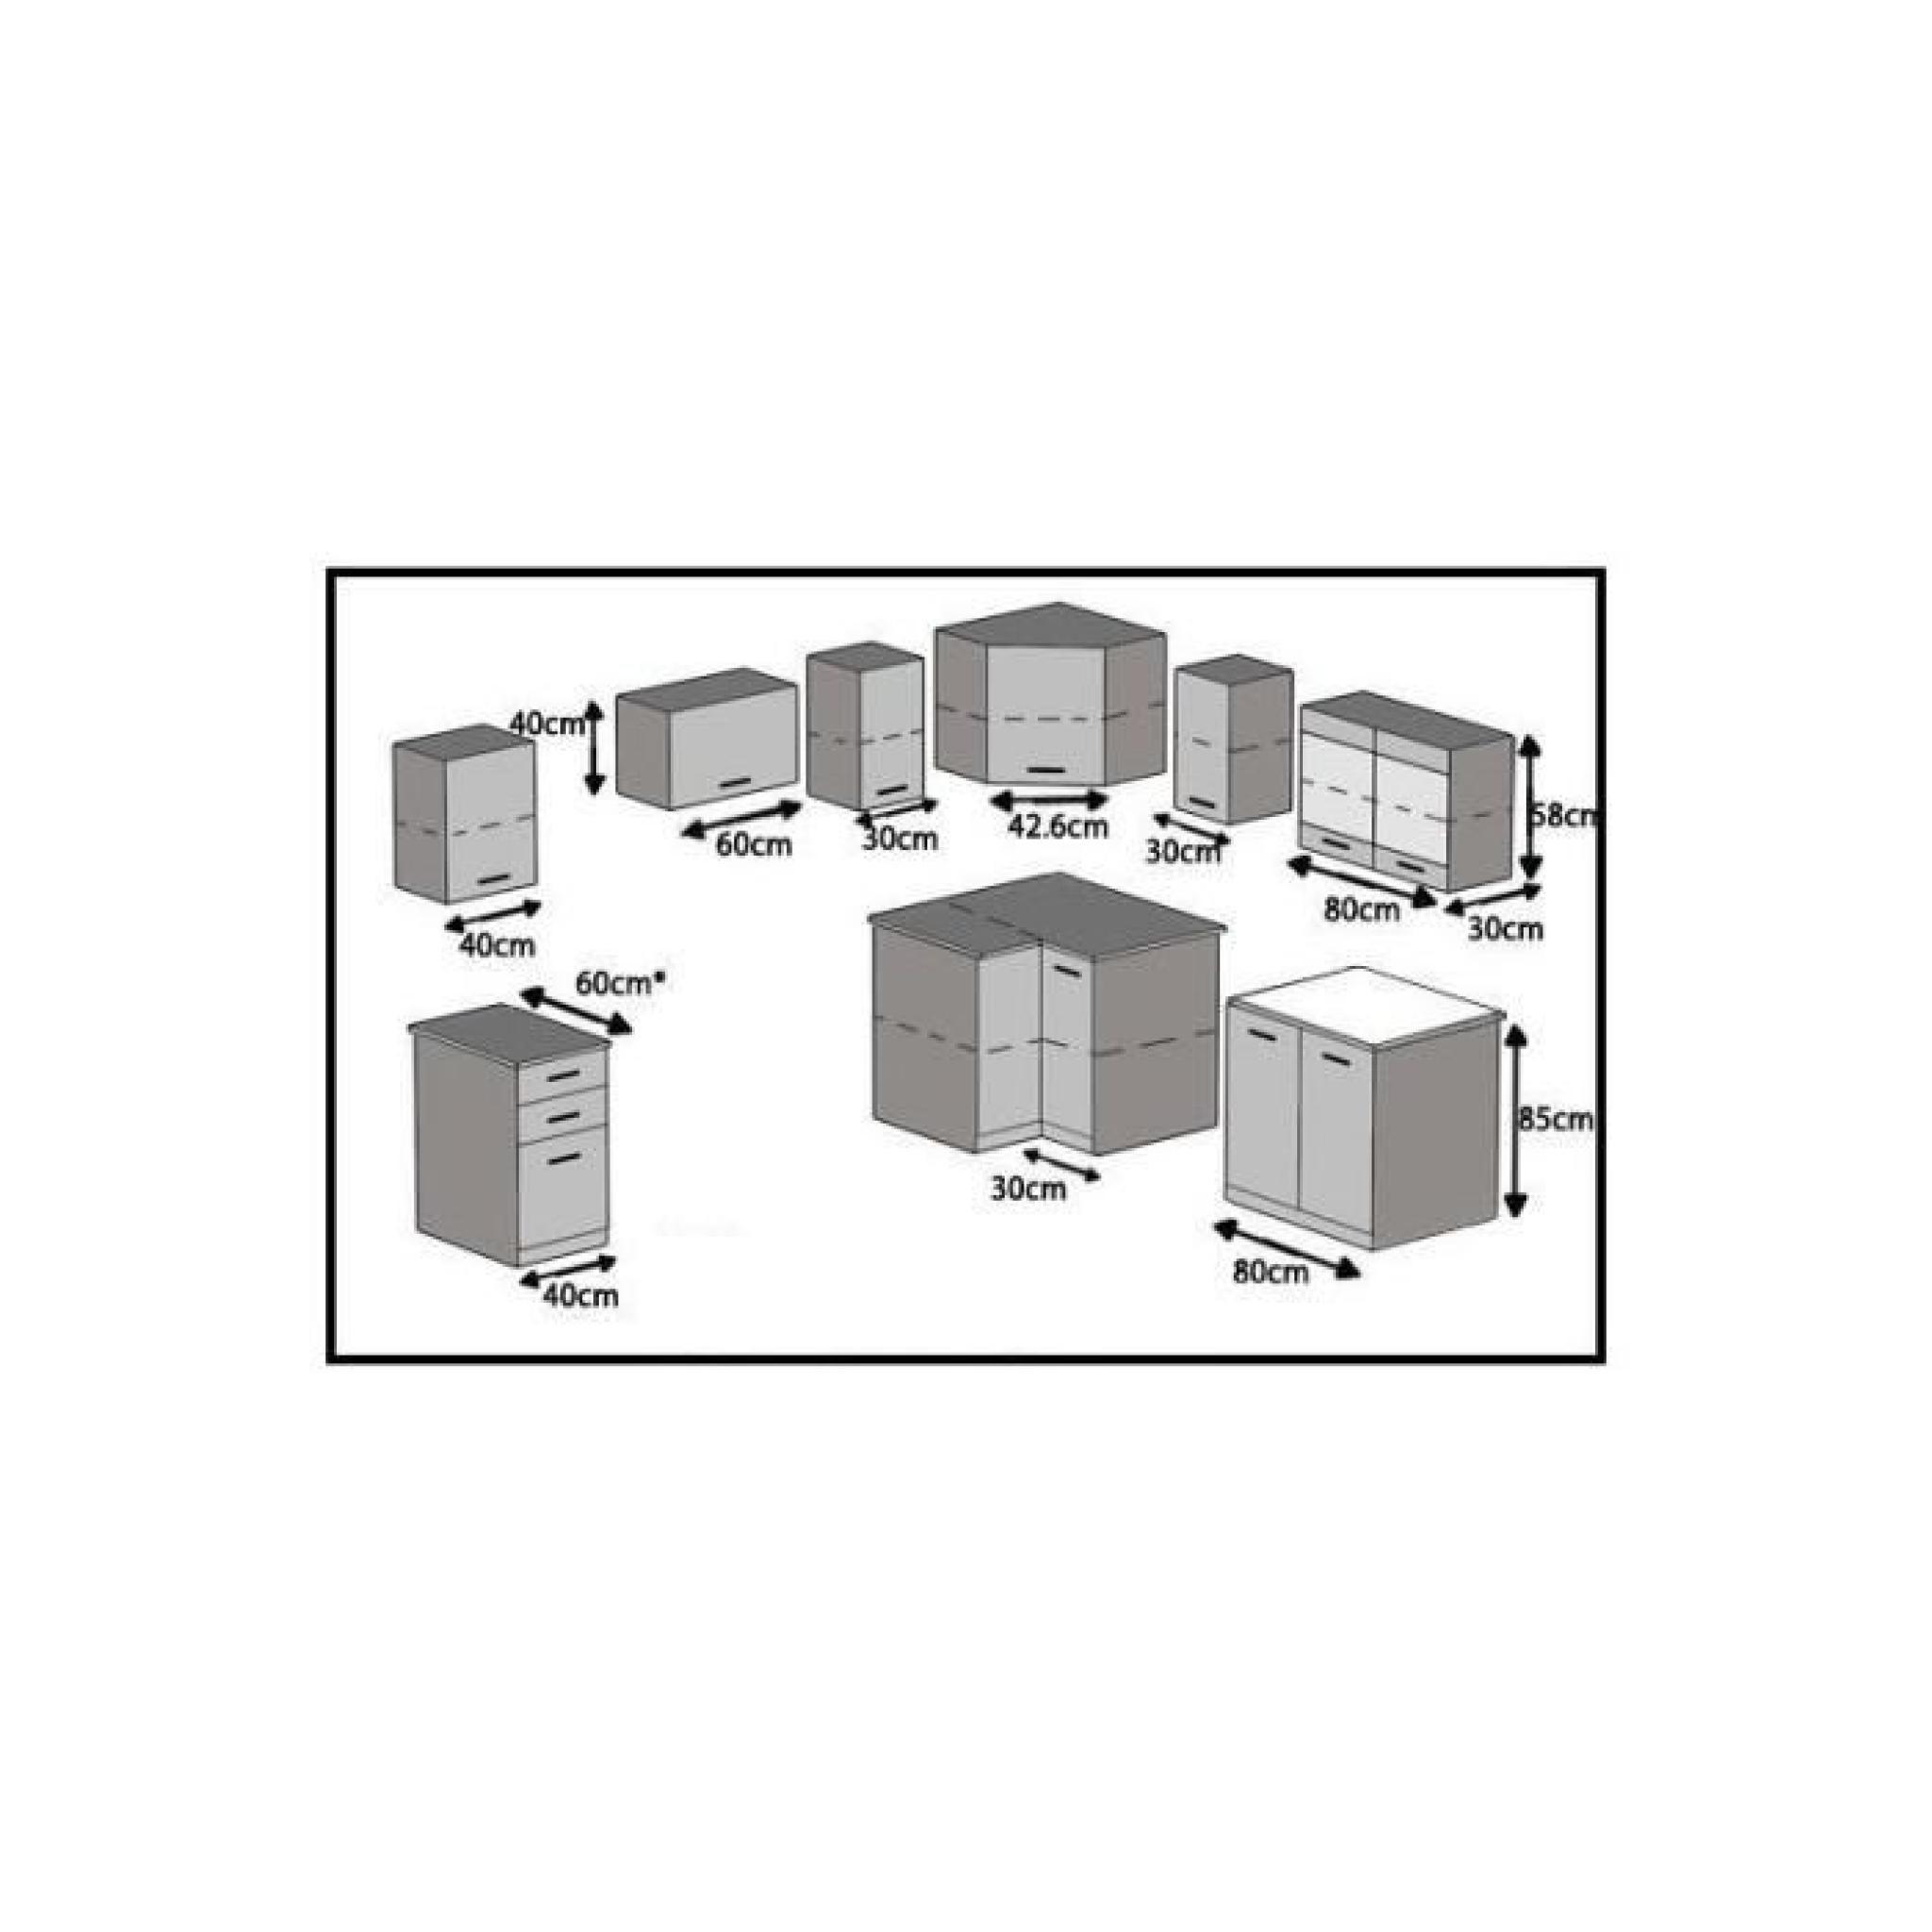 Justhome torino 4 l cuisine quip e compl te 190x170 cm for Cuisine complete design